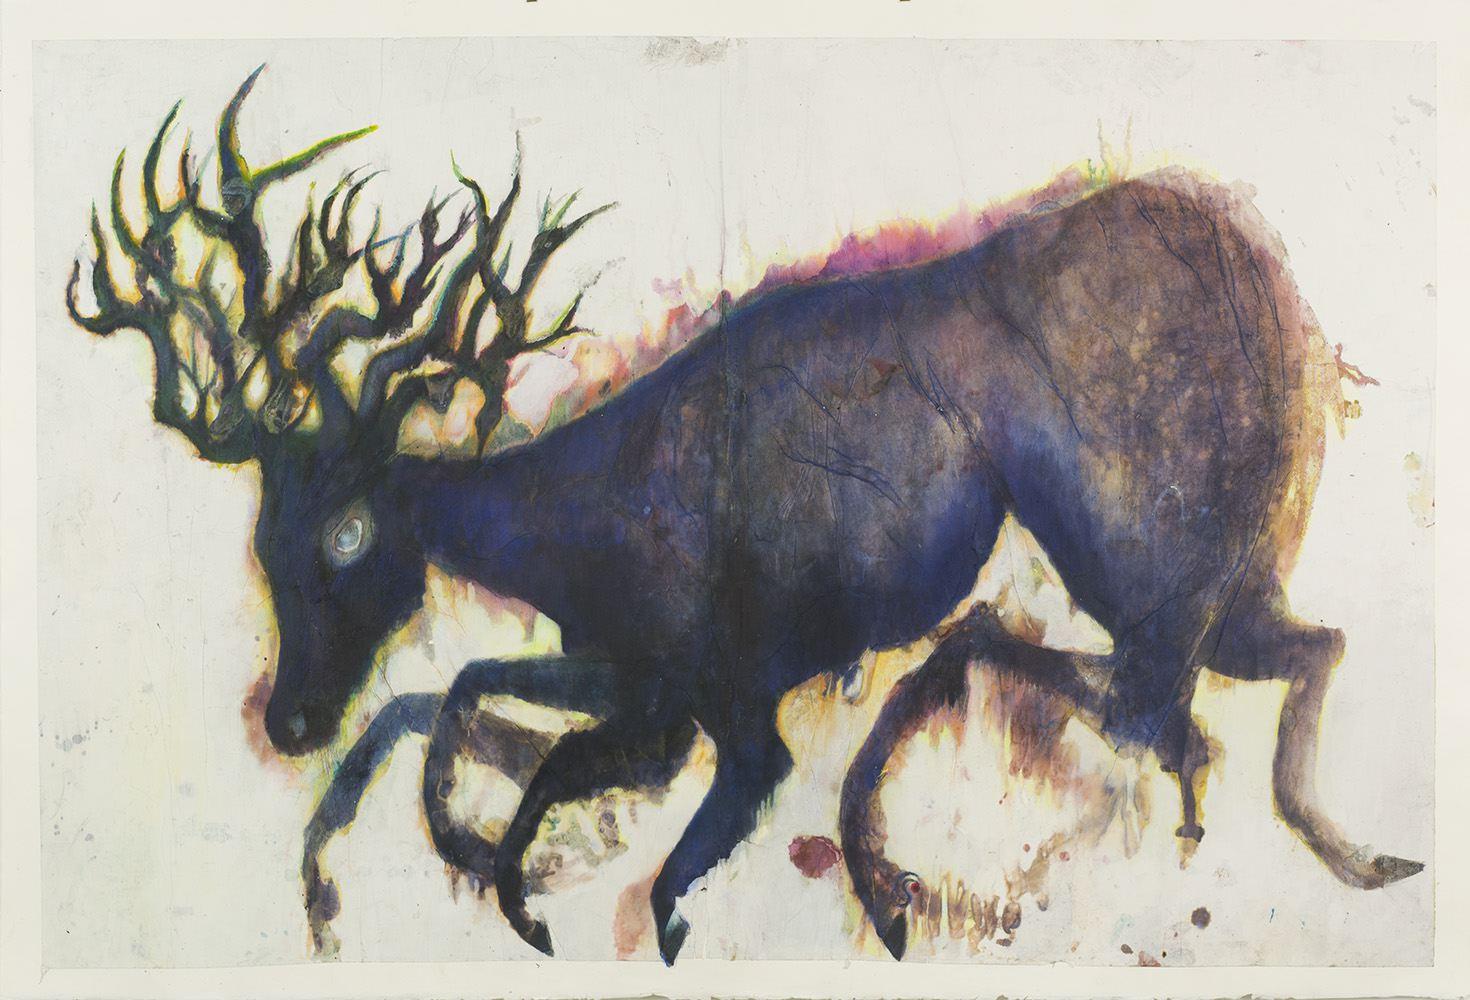 Christine Sefolosha,   Véloce  , 2015,Ink, mixed media, chine collé on Arches paper,40 x 58 inches,101.6 x 147.3 cm,CSe 108